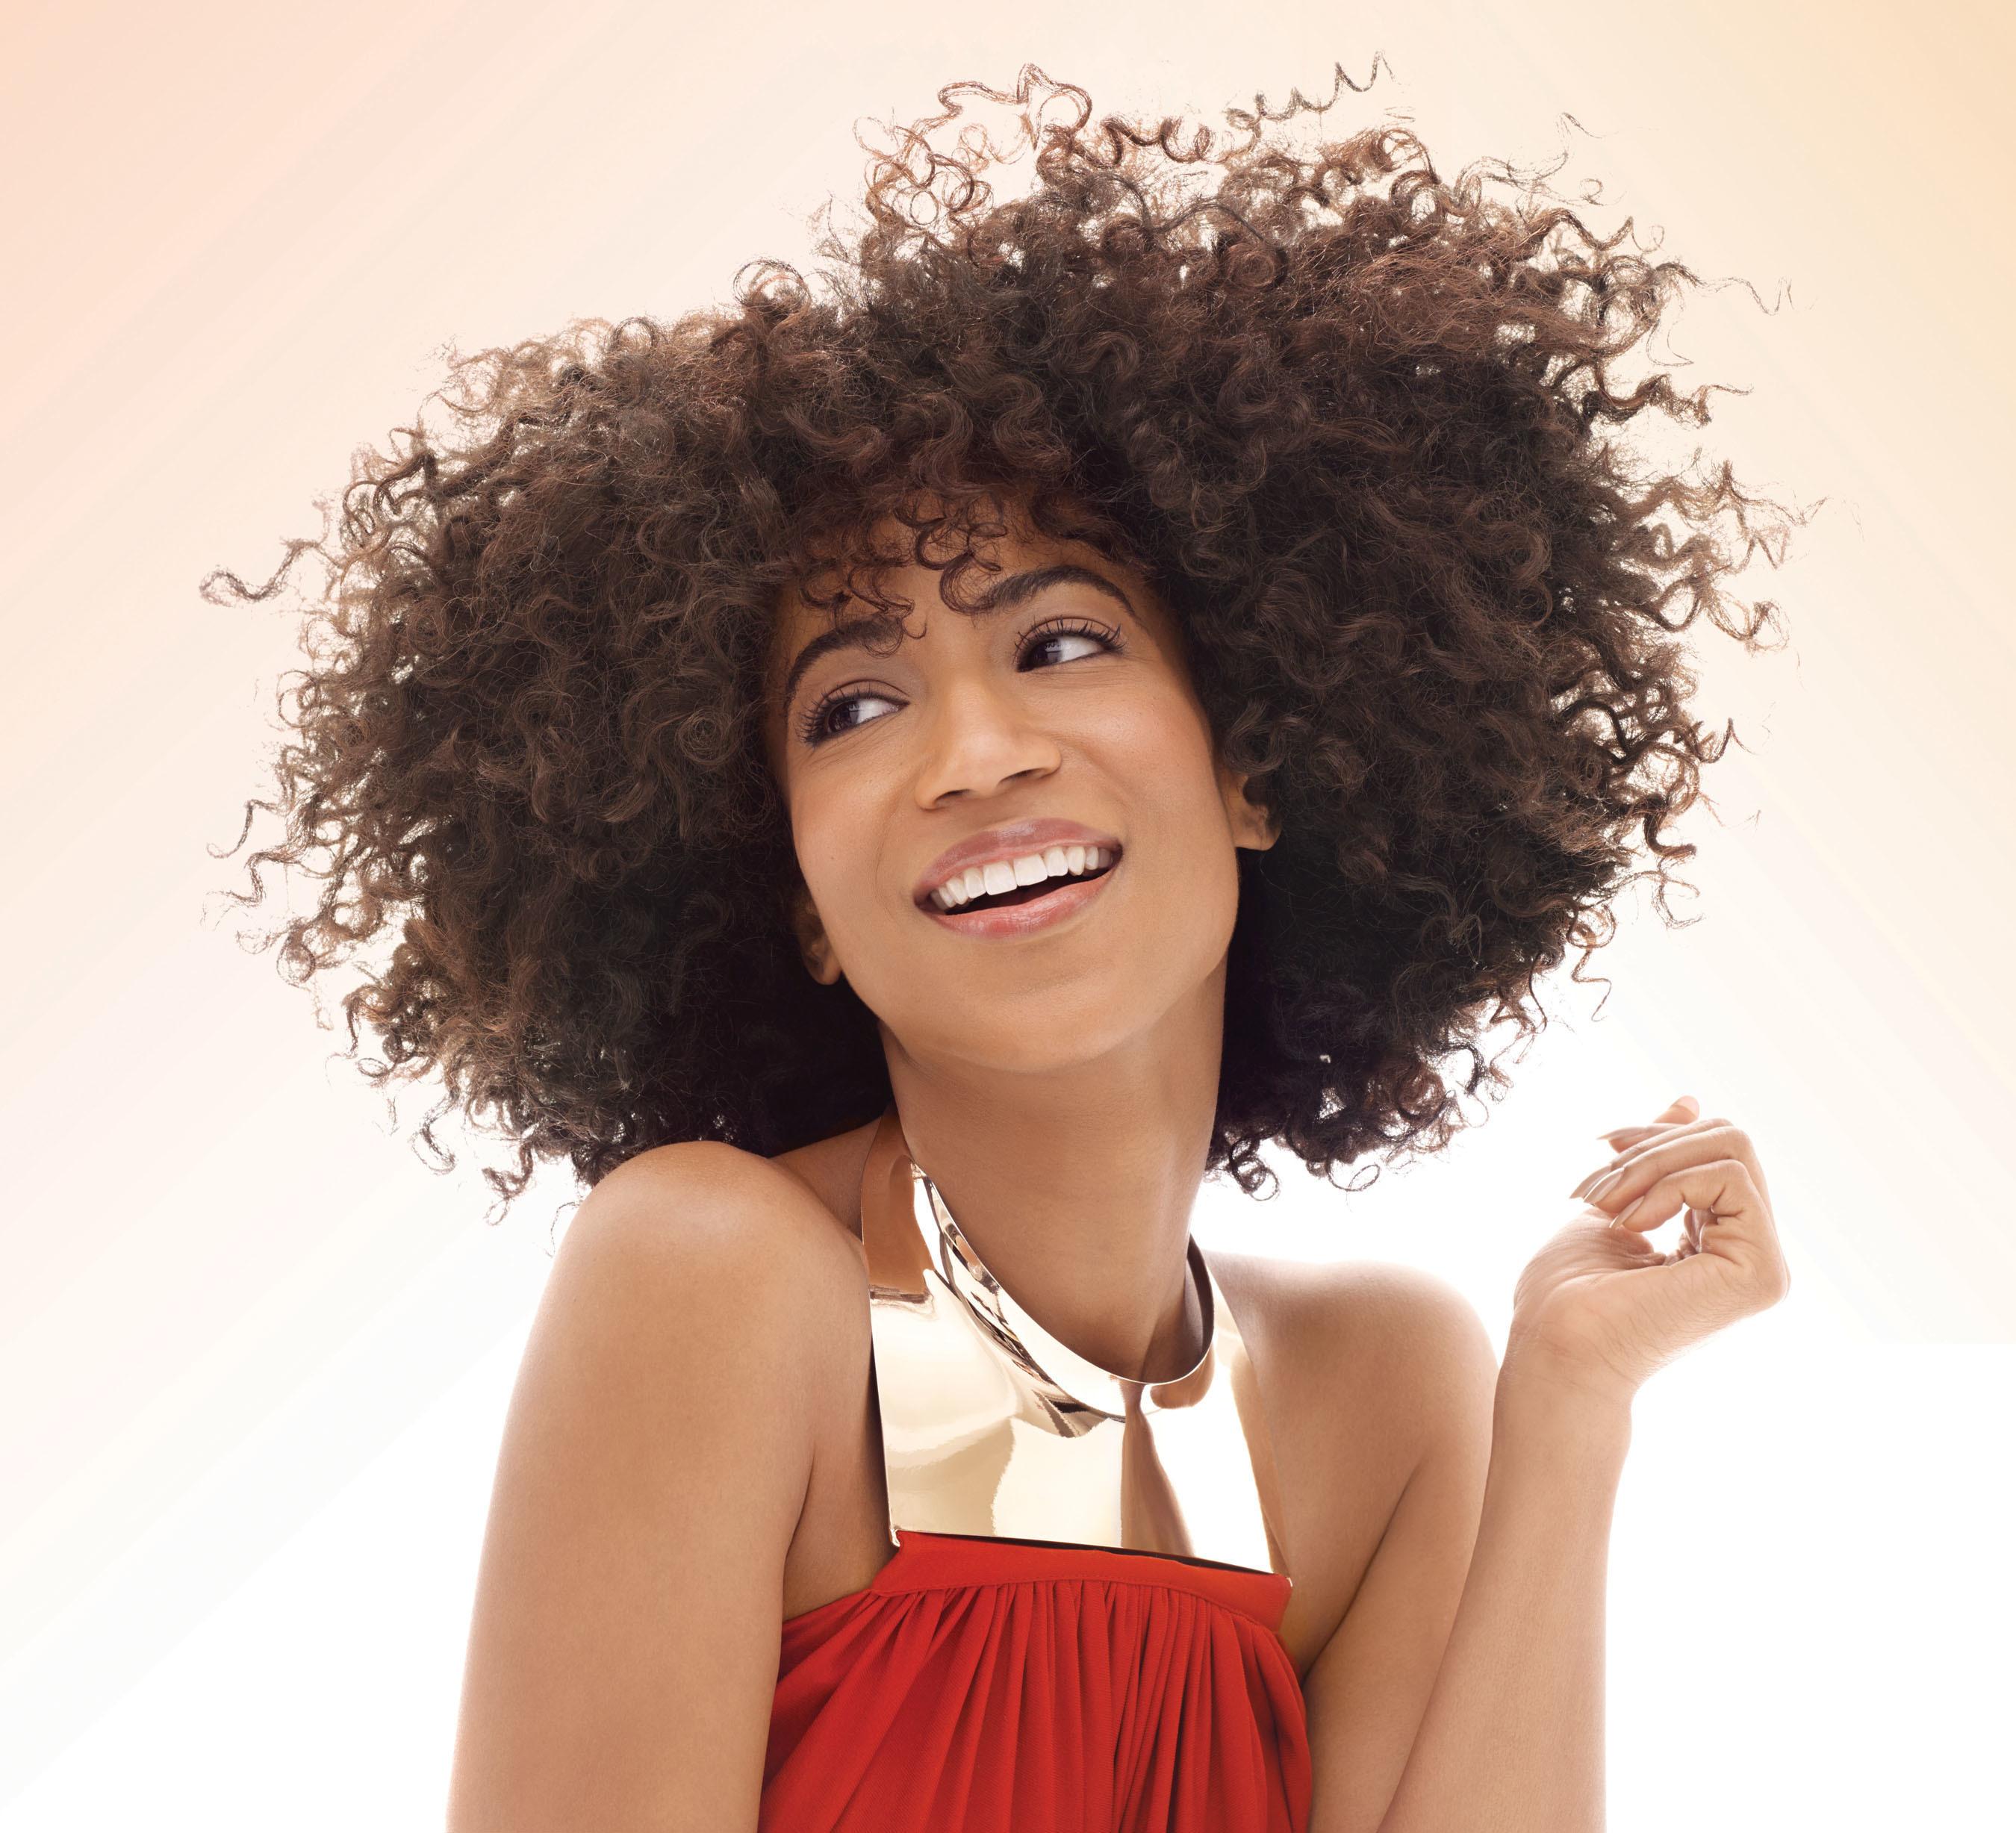 Creme of Nature(R) Names Actress, Singer Africa Miranda as its New Brand Ambassador. (PRNewsFoto/Creme of Nature)